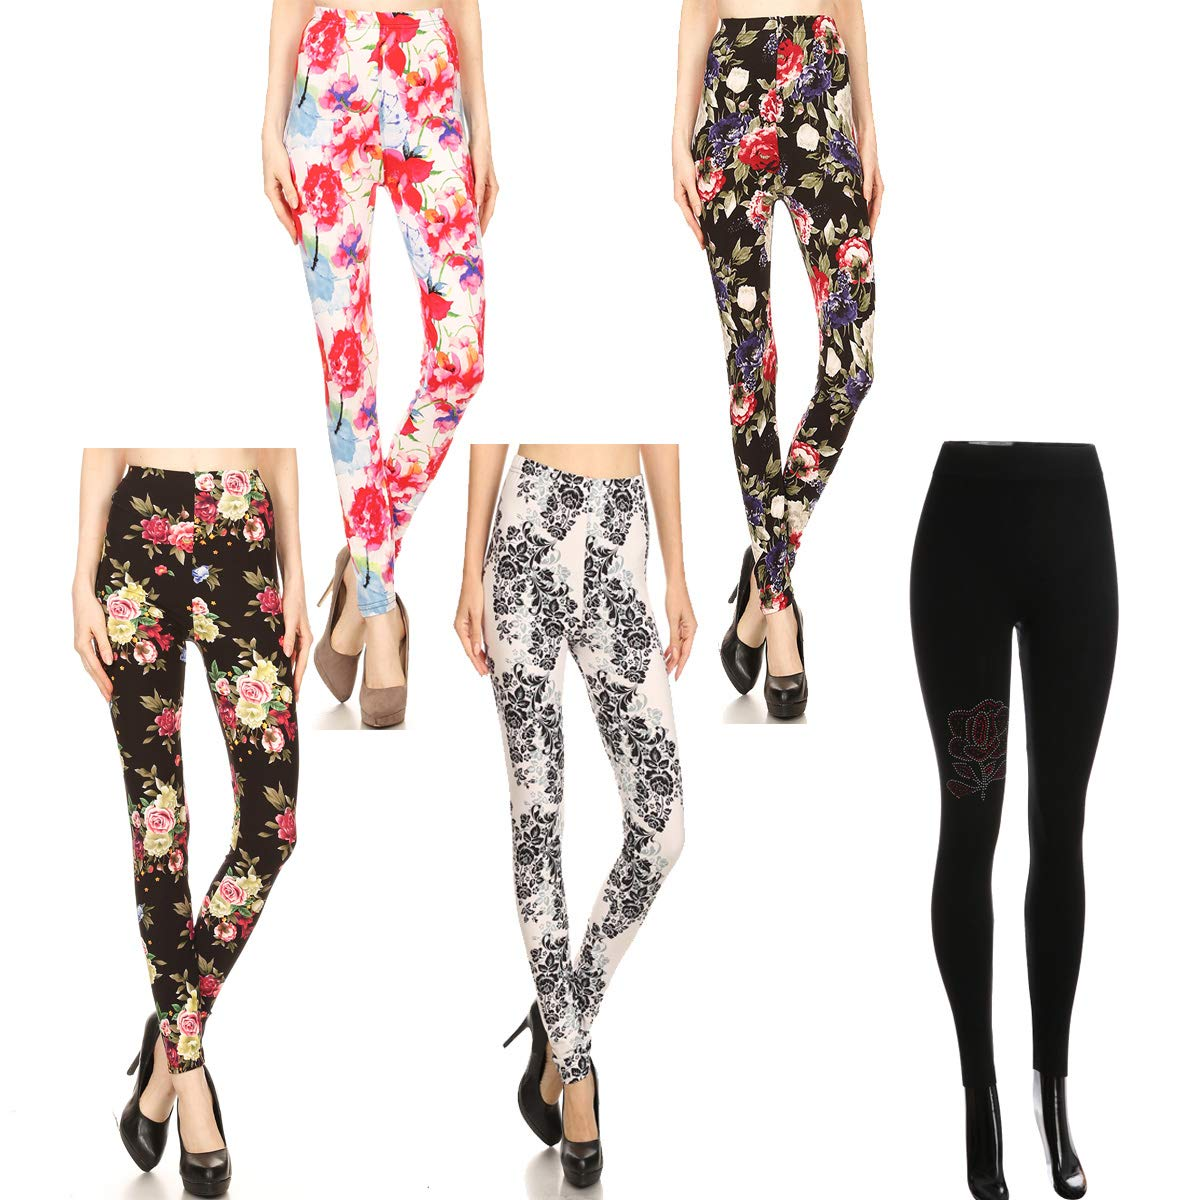 Wholesale Floral Leggings for Women Flower Print Design Pattern, One Size 5-Pack